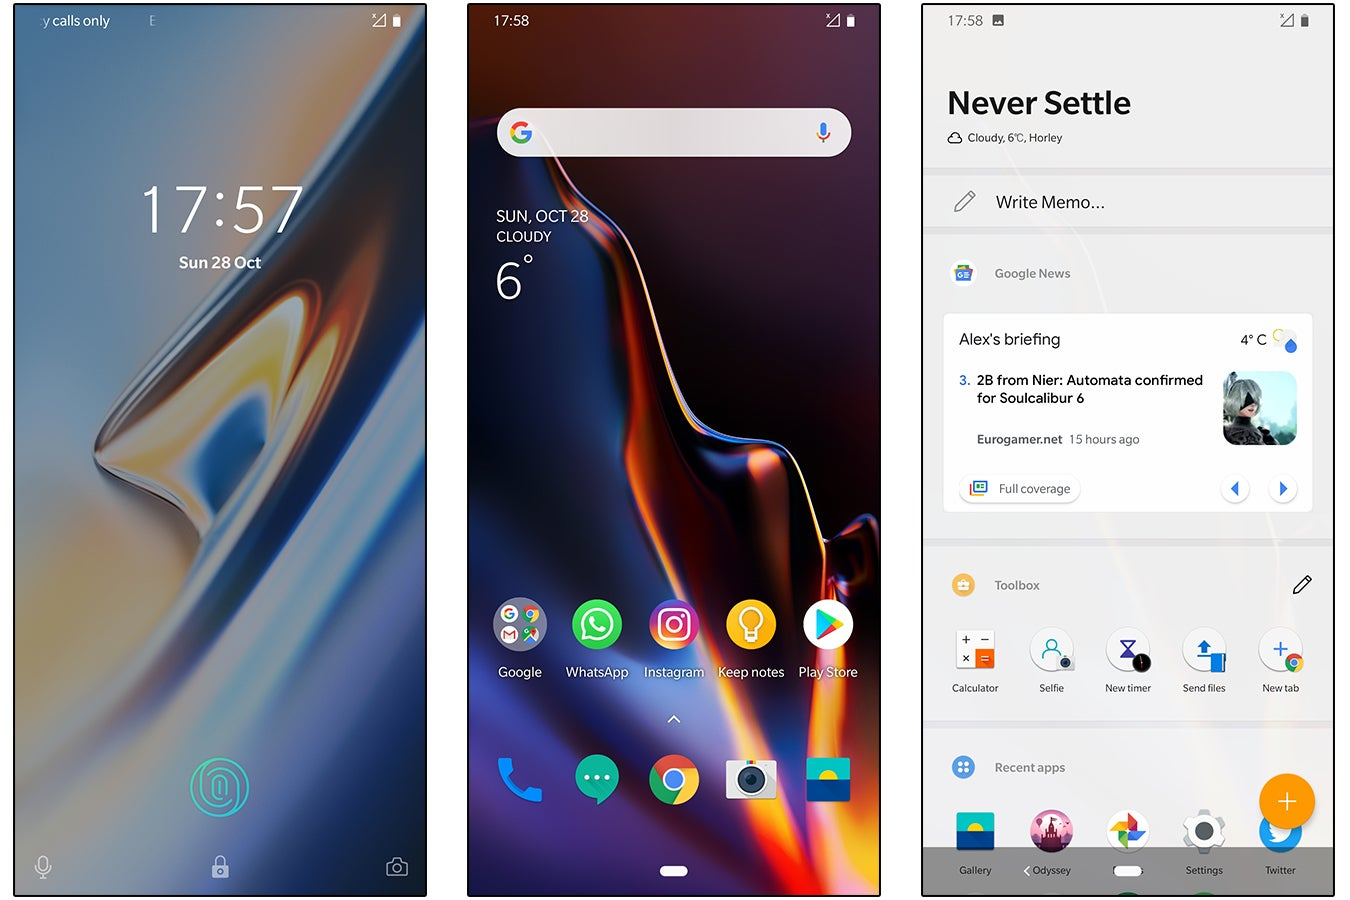 OnePlus 6T OxygenOS скриншоты 1, 2, 3